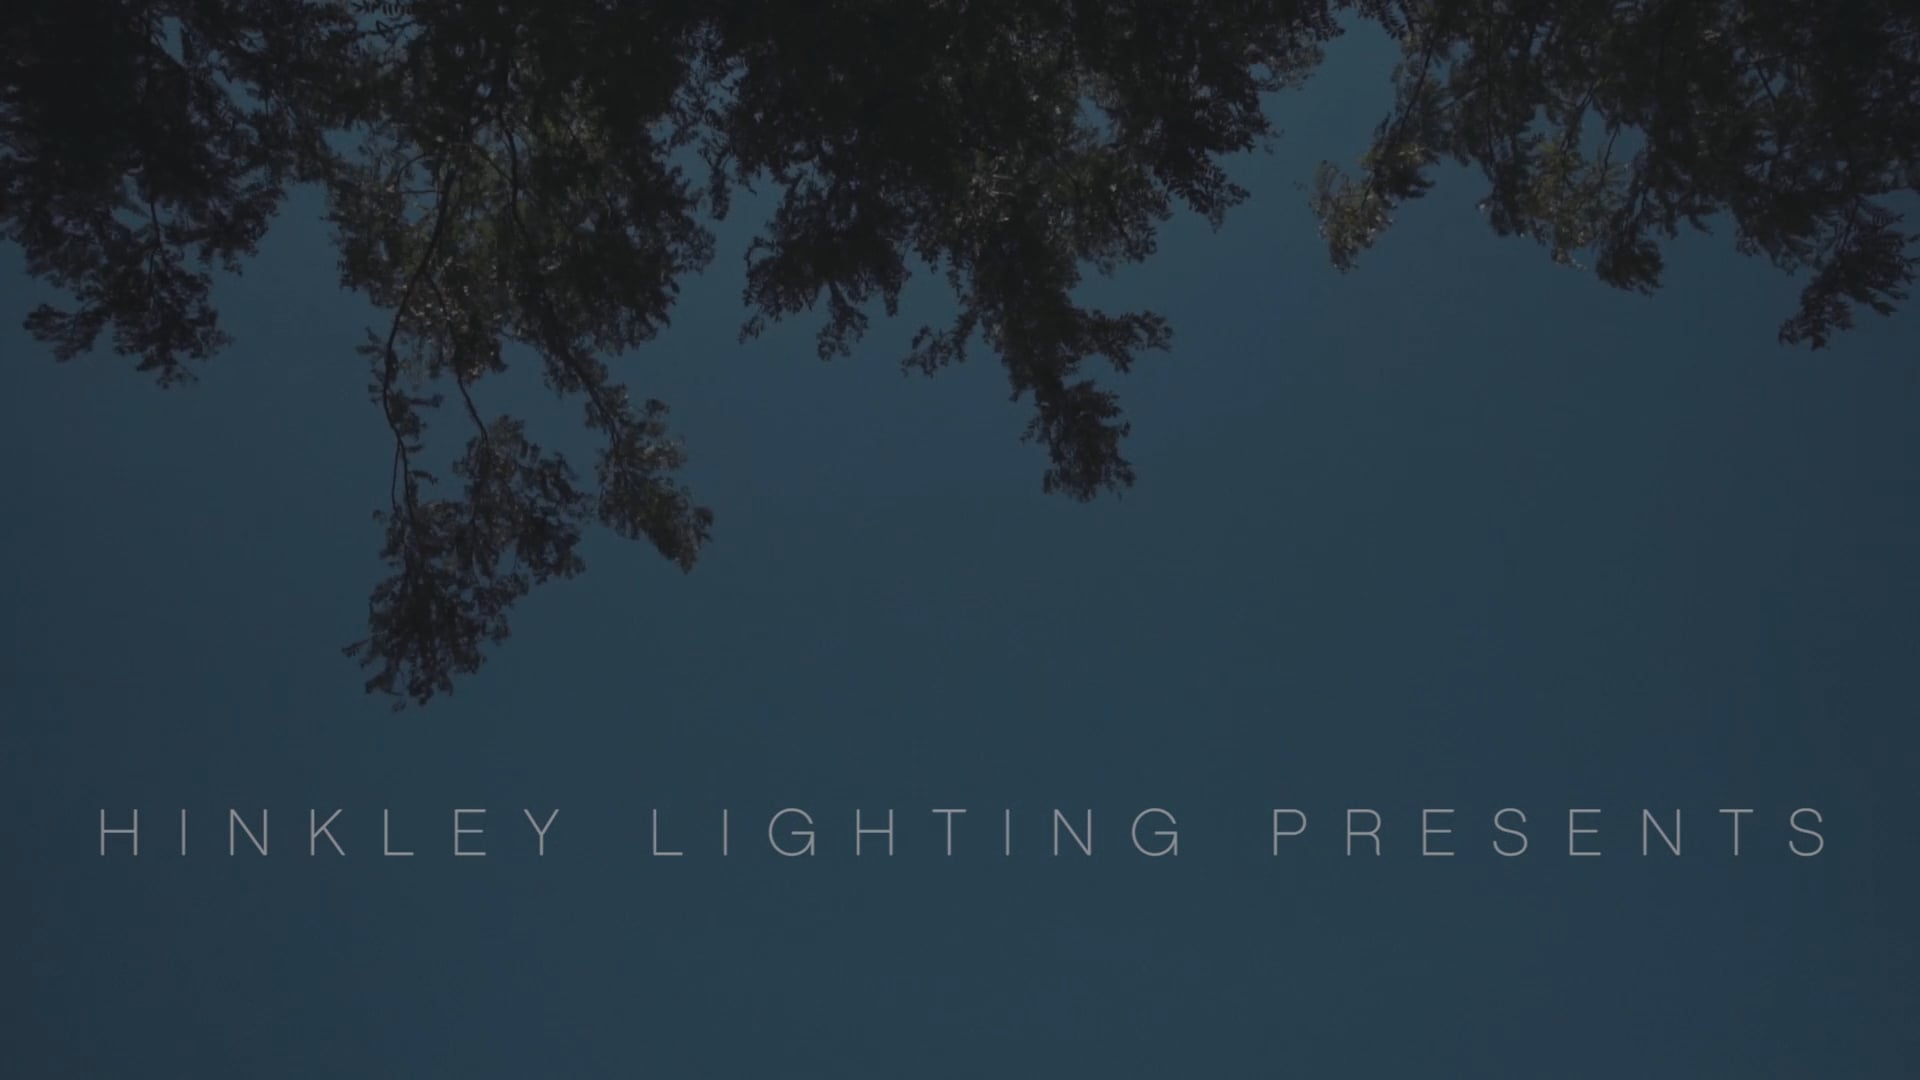 Hinkley Lighting - David Deming